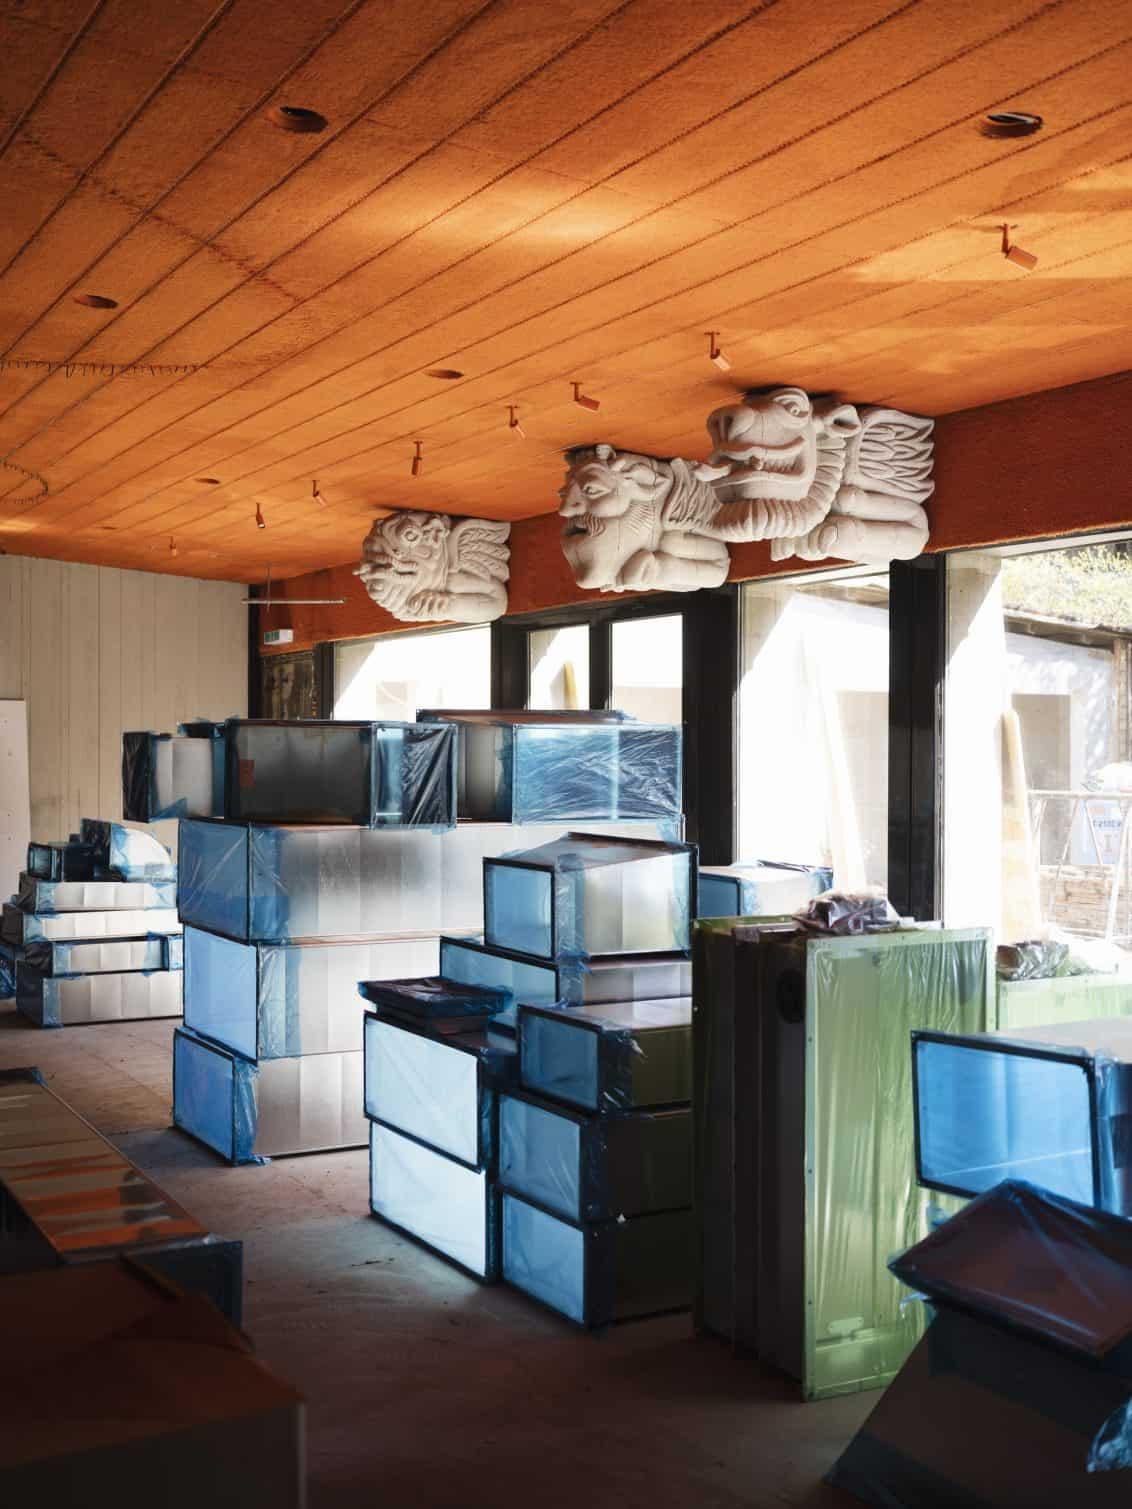 Tantris_Baustelle_new_Restaurant_TantrisDNA-1132x1509